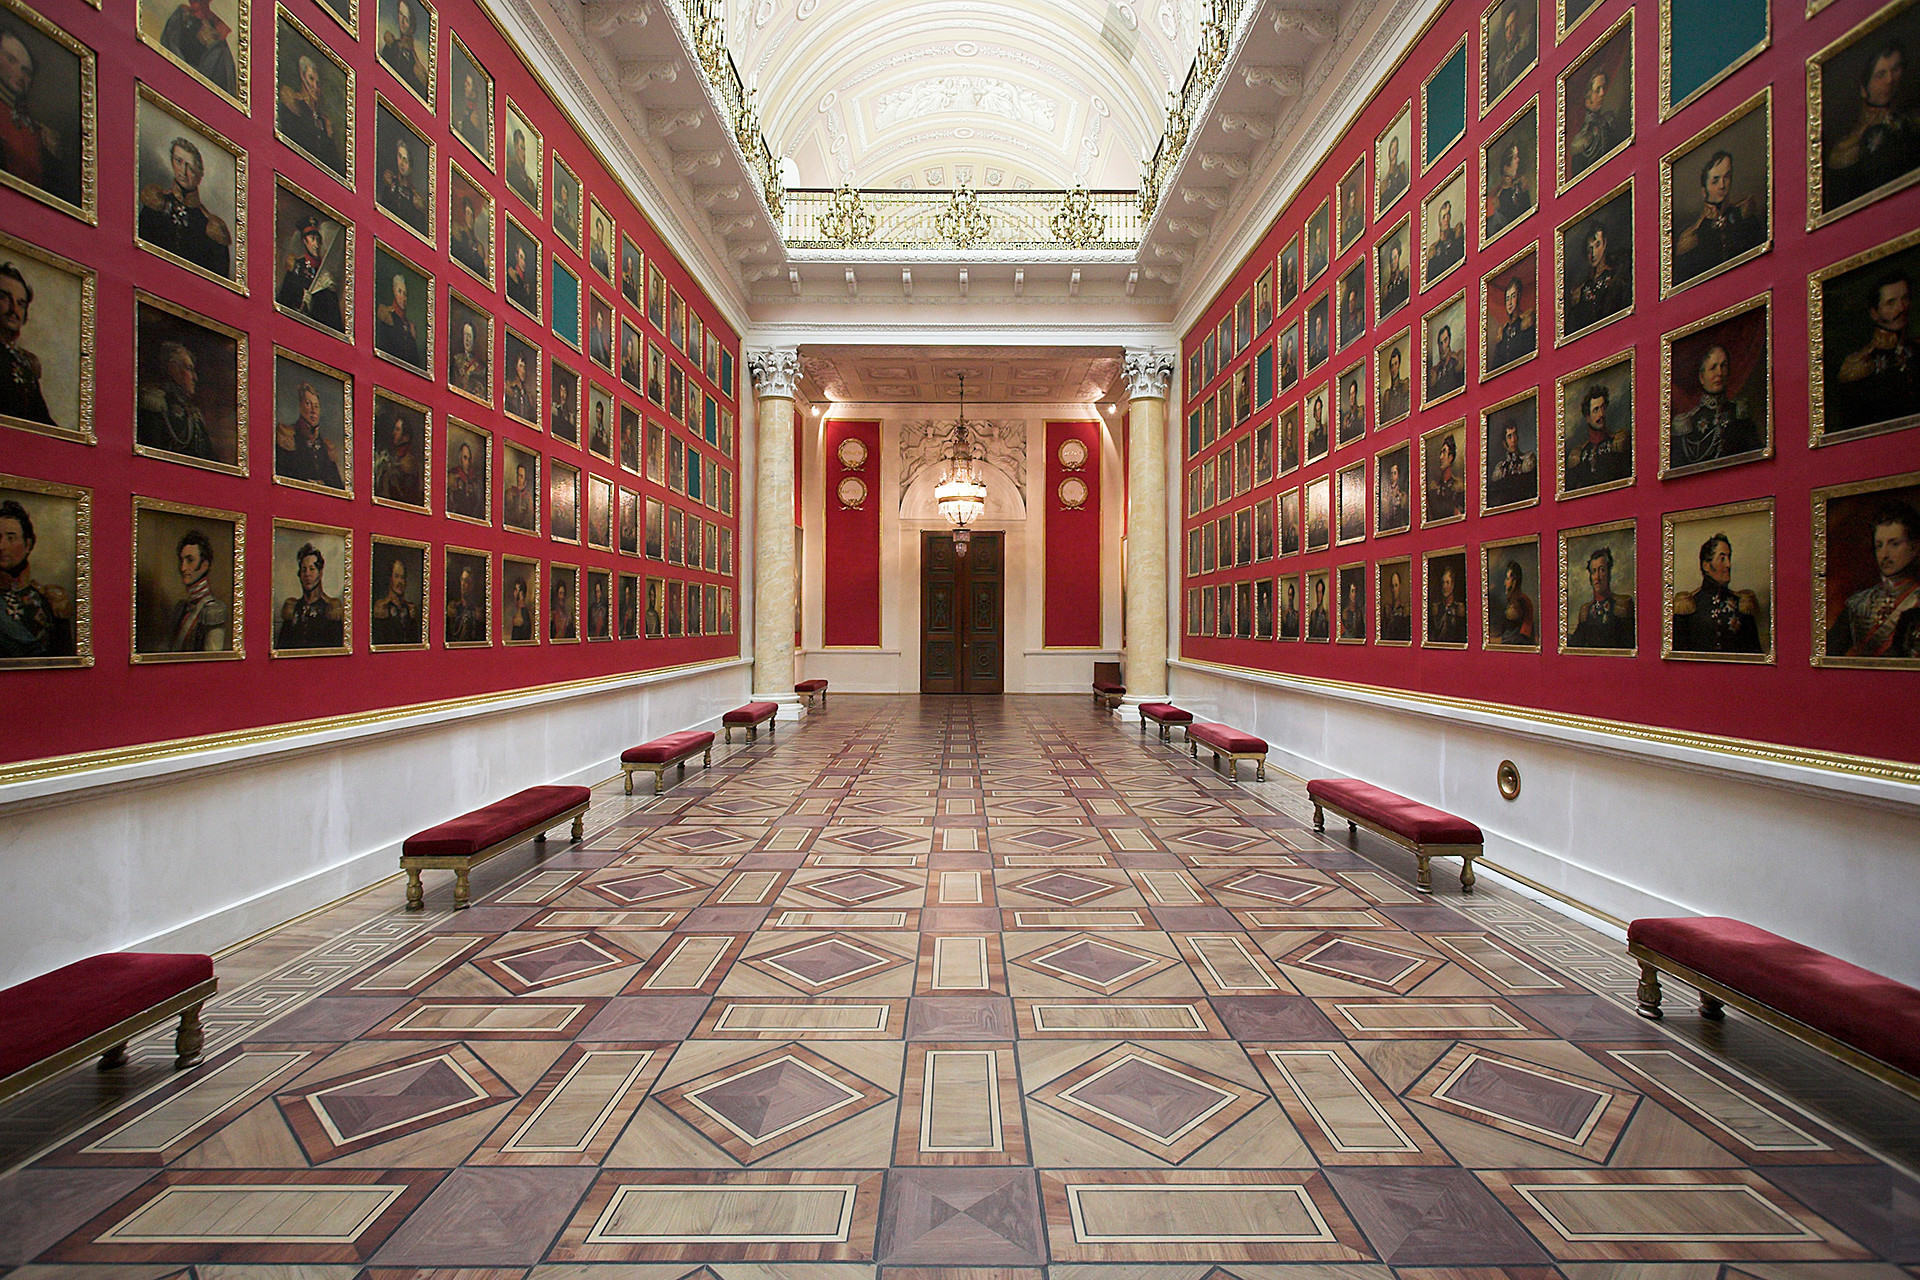 Државни музеј Ермитаж, Санкт Петербург